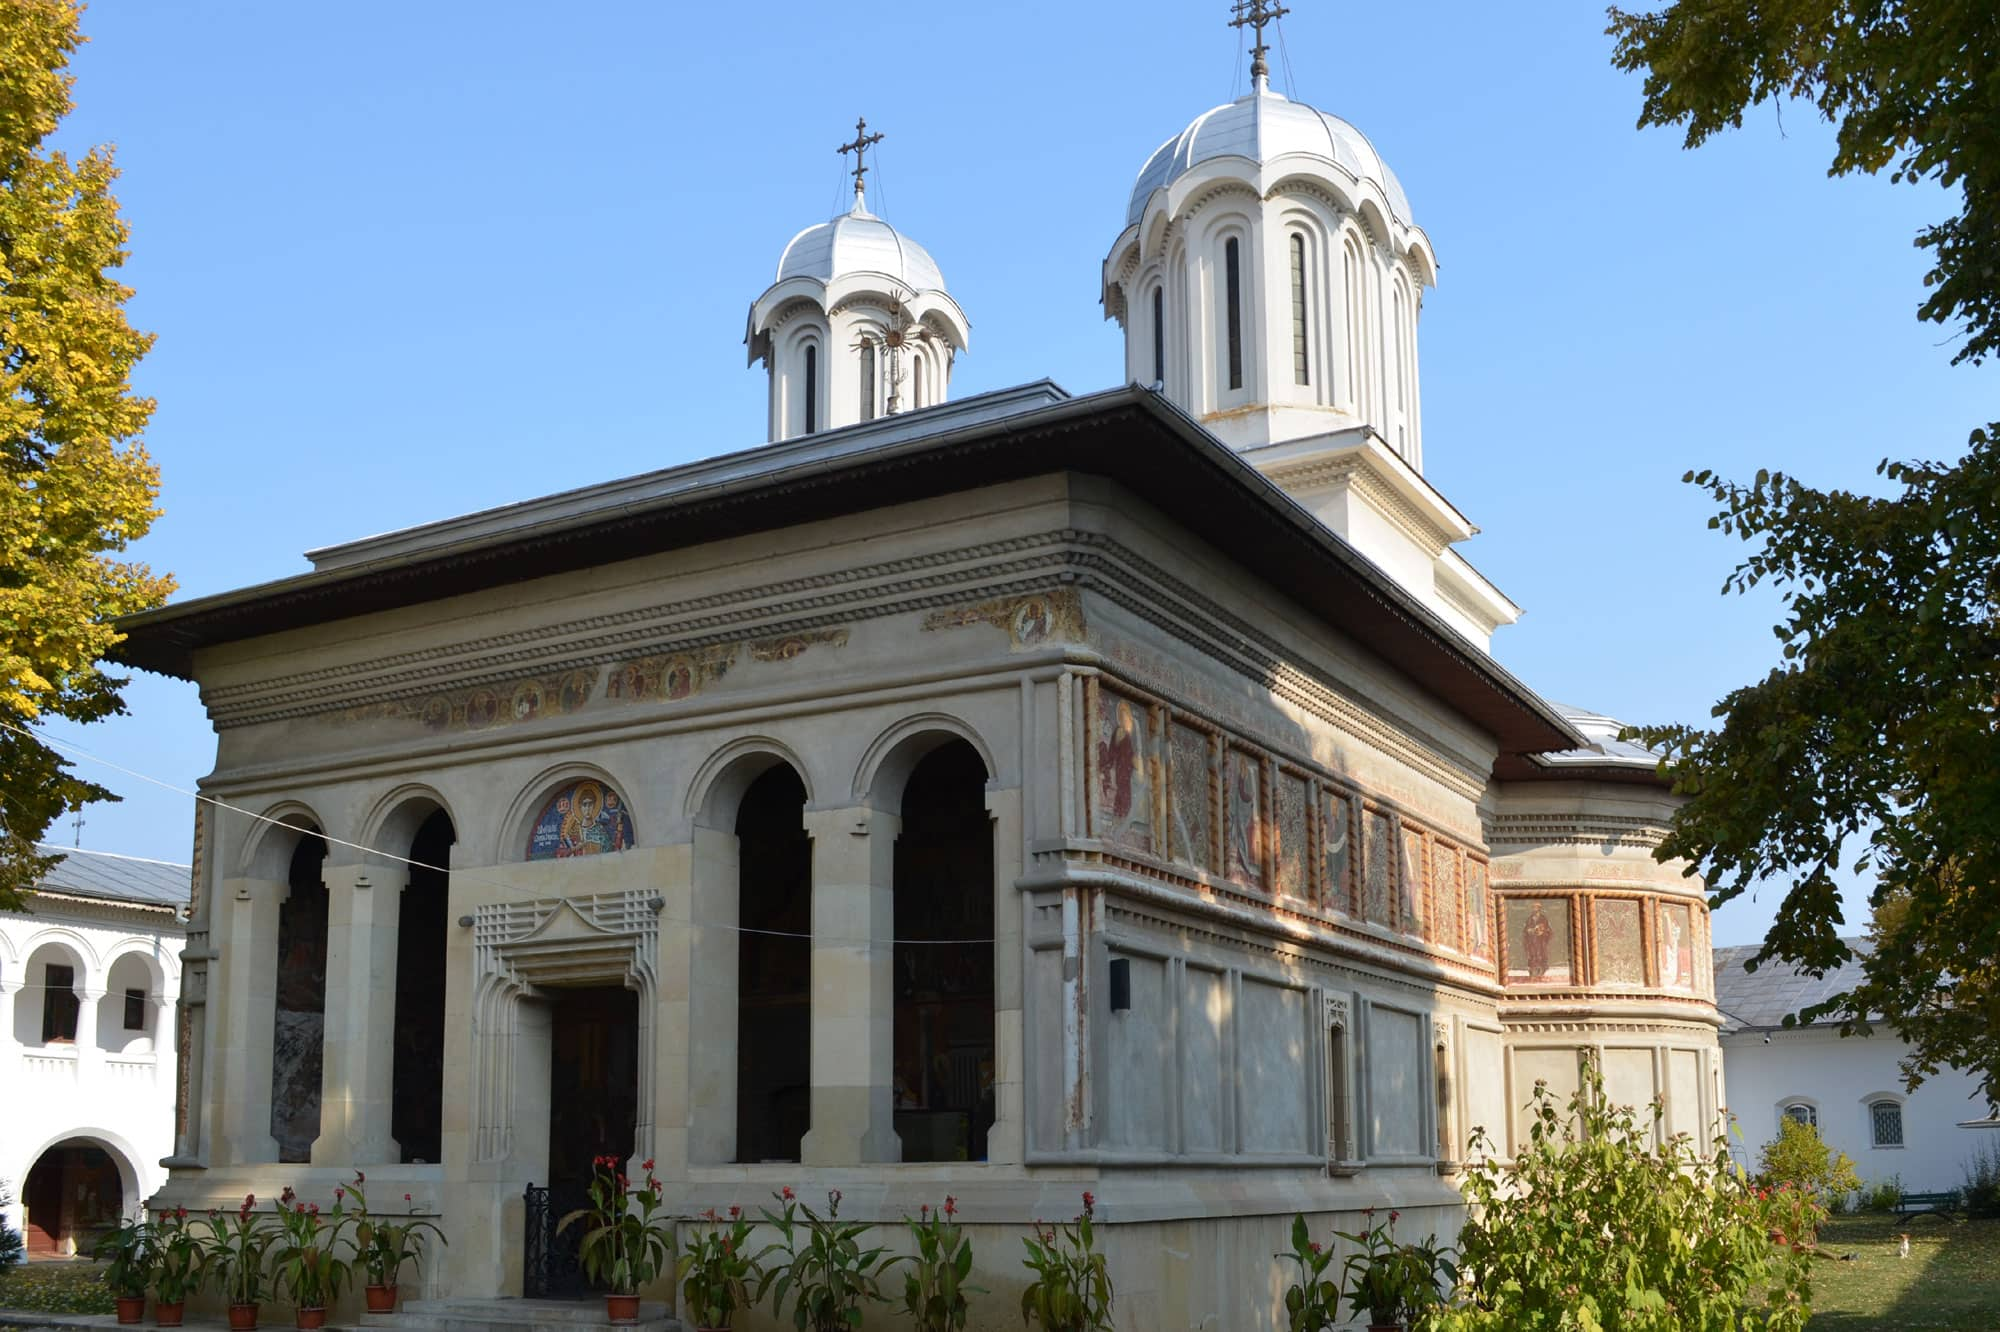 mogosoaia-palace-snagov-monastery-caldarusani-monastery-6